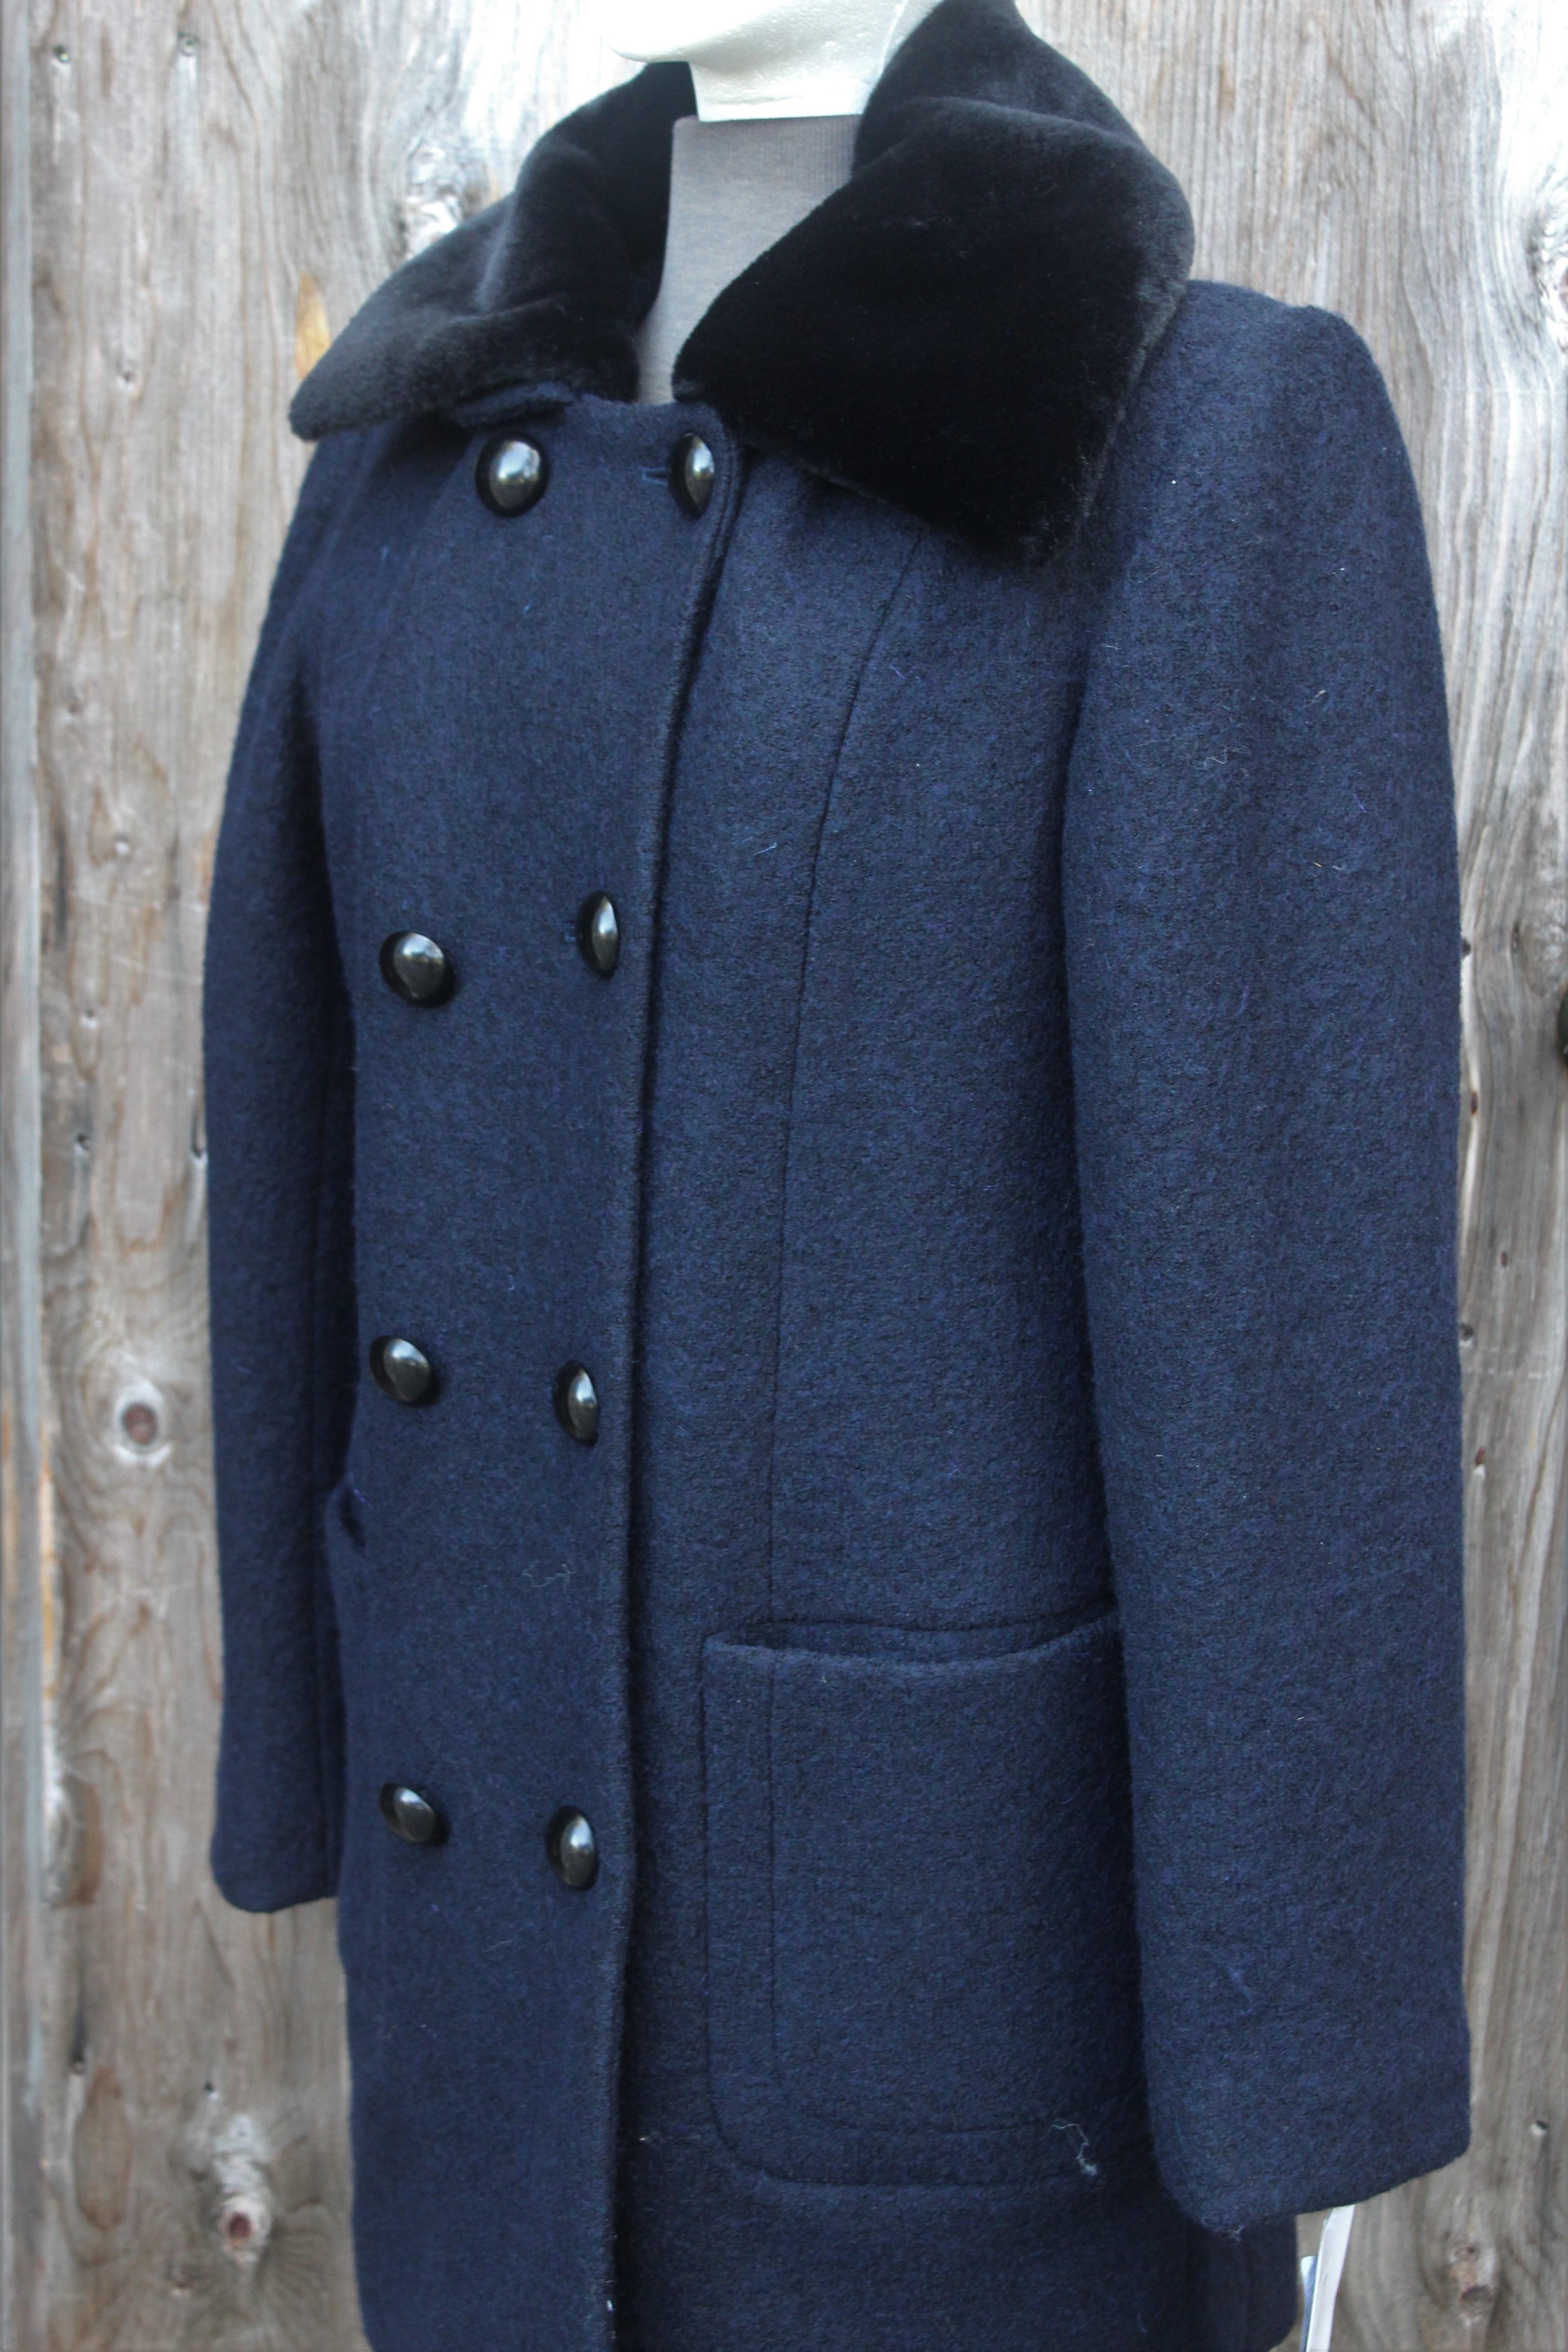 Wool- $250.00 Niccolini: Style #D1758P